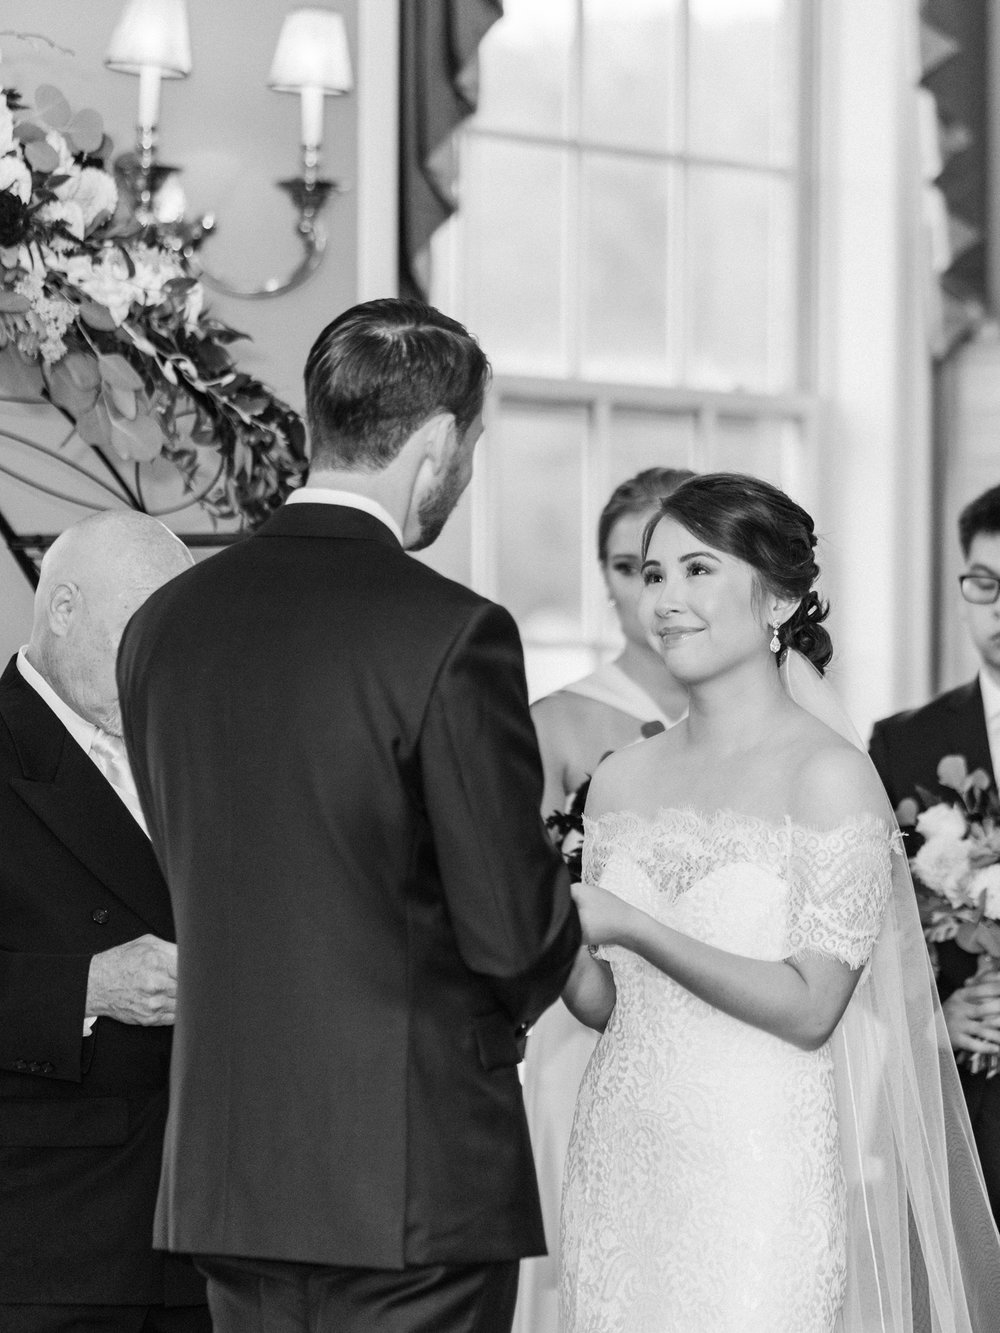 hannah-cochran-photography-joe-and-susan-wedding-bw.jpg